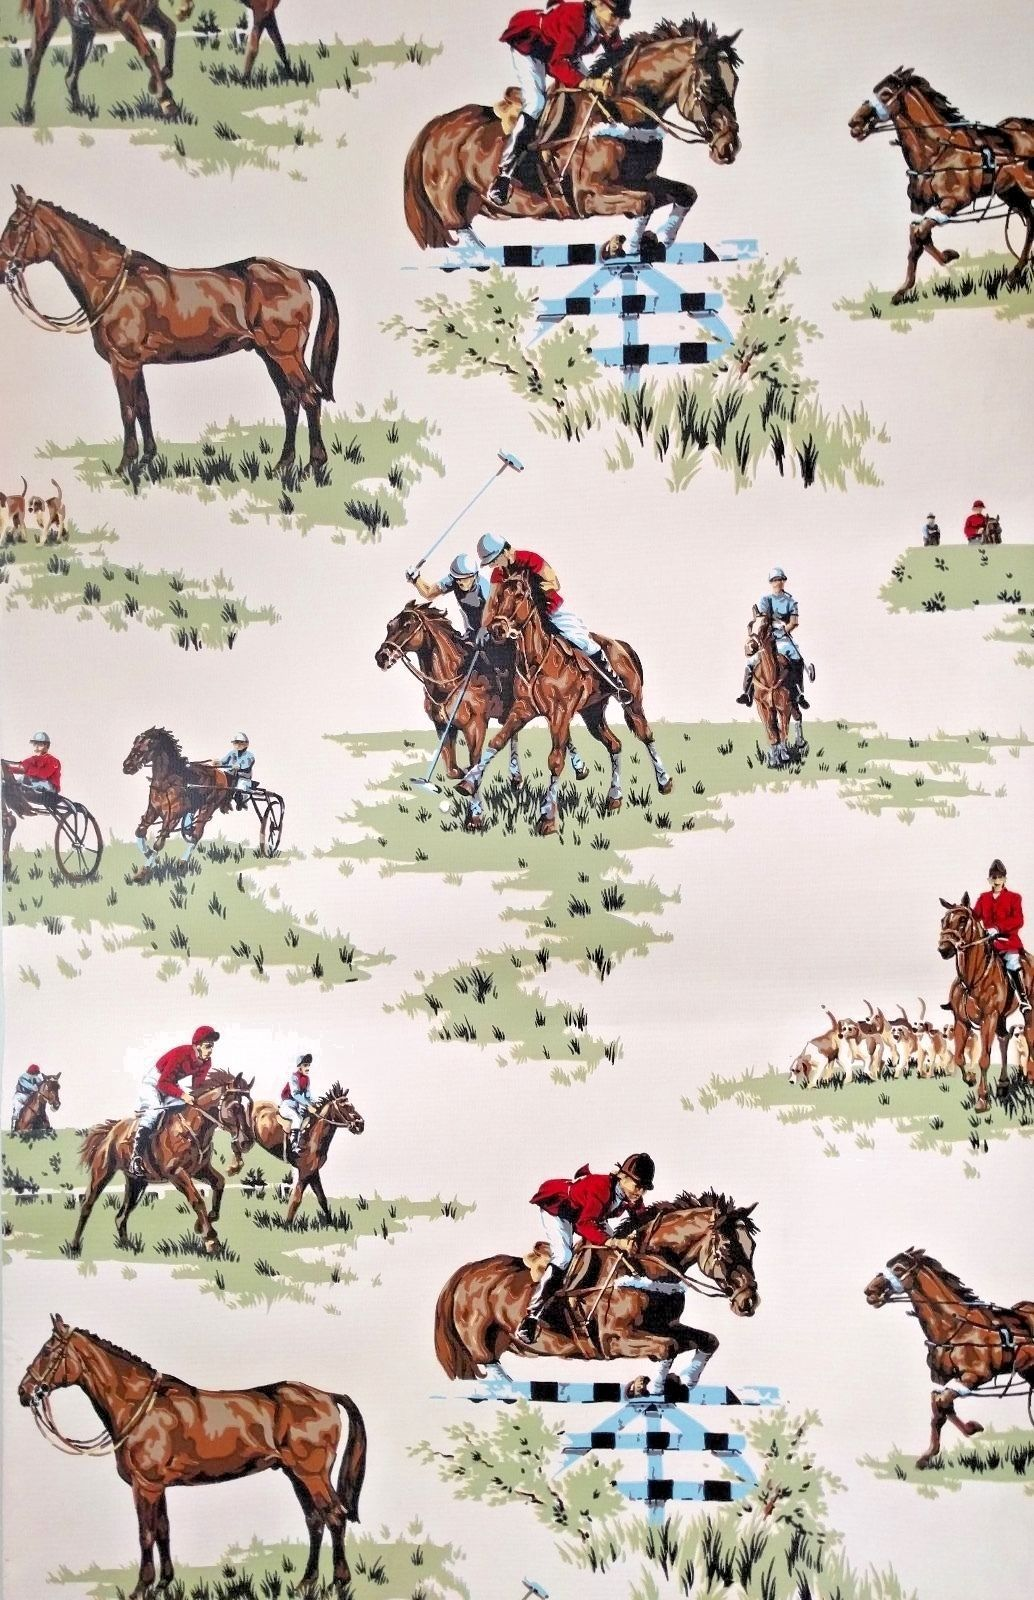 Best Wallpaper Horse Vintage - cbb06a6de3235add97c0d847e2aedb9d  Image_458945.jpg